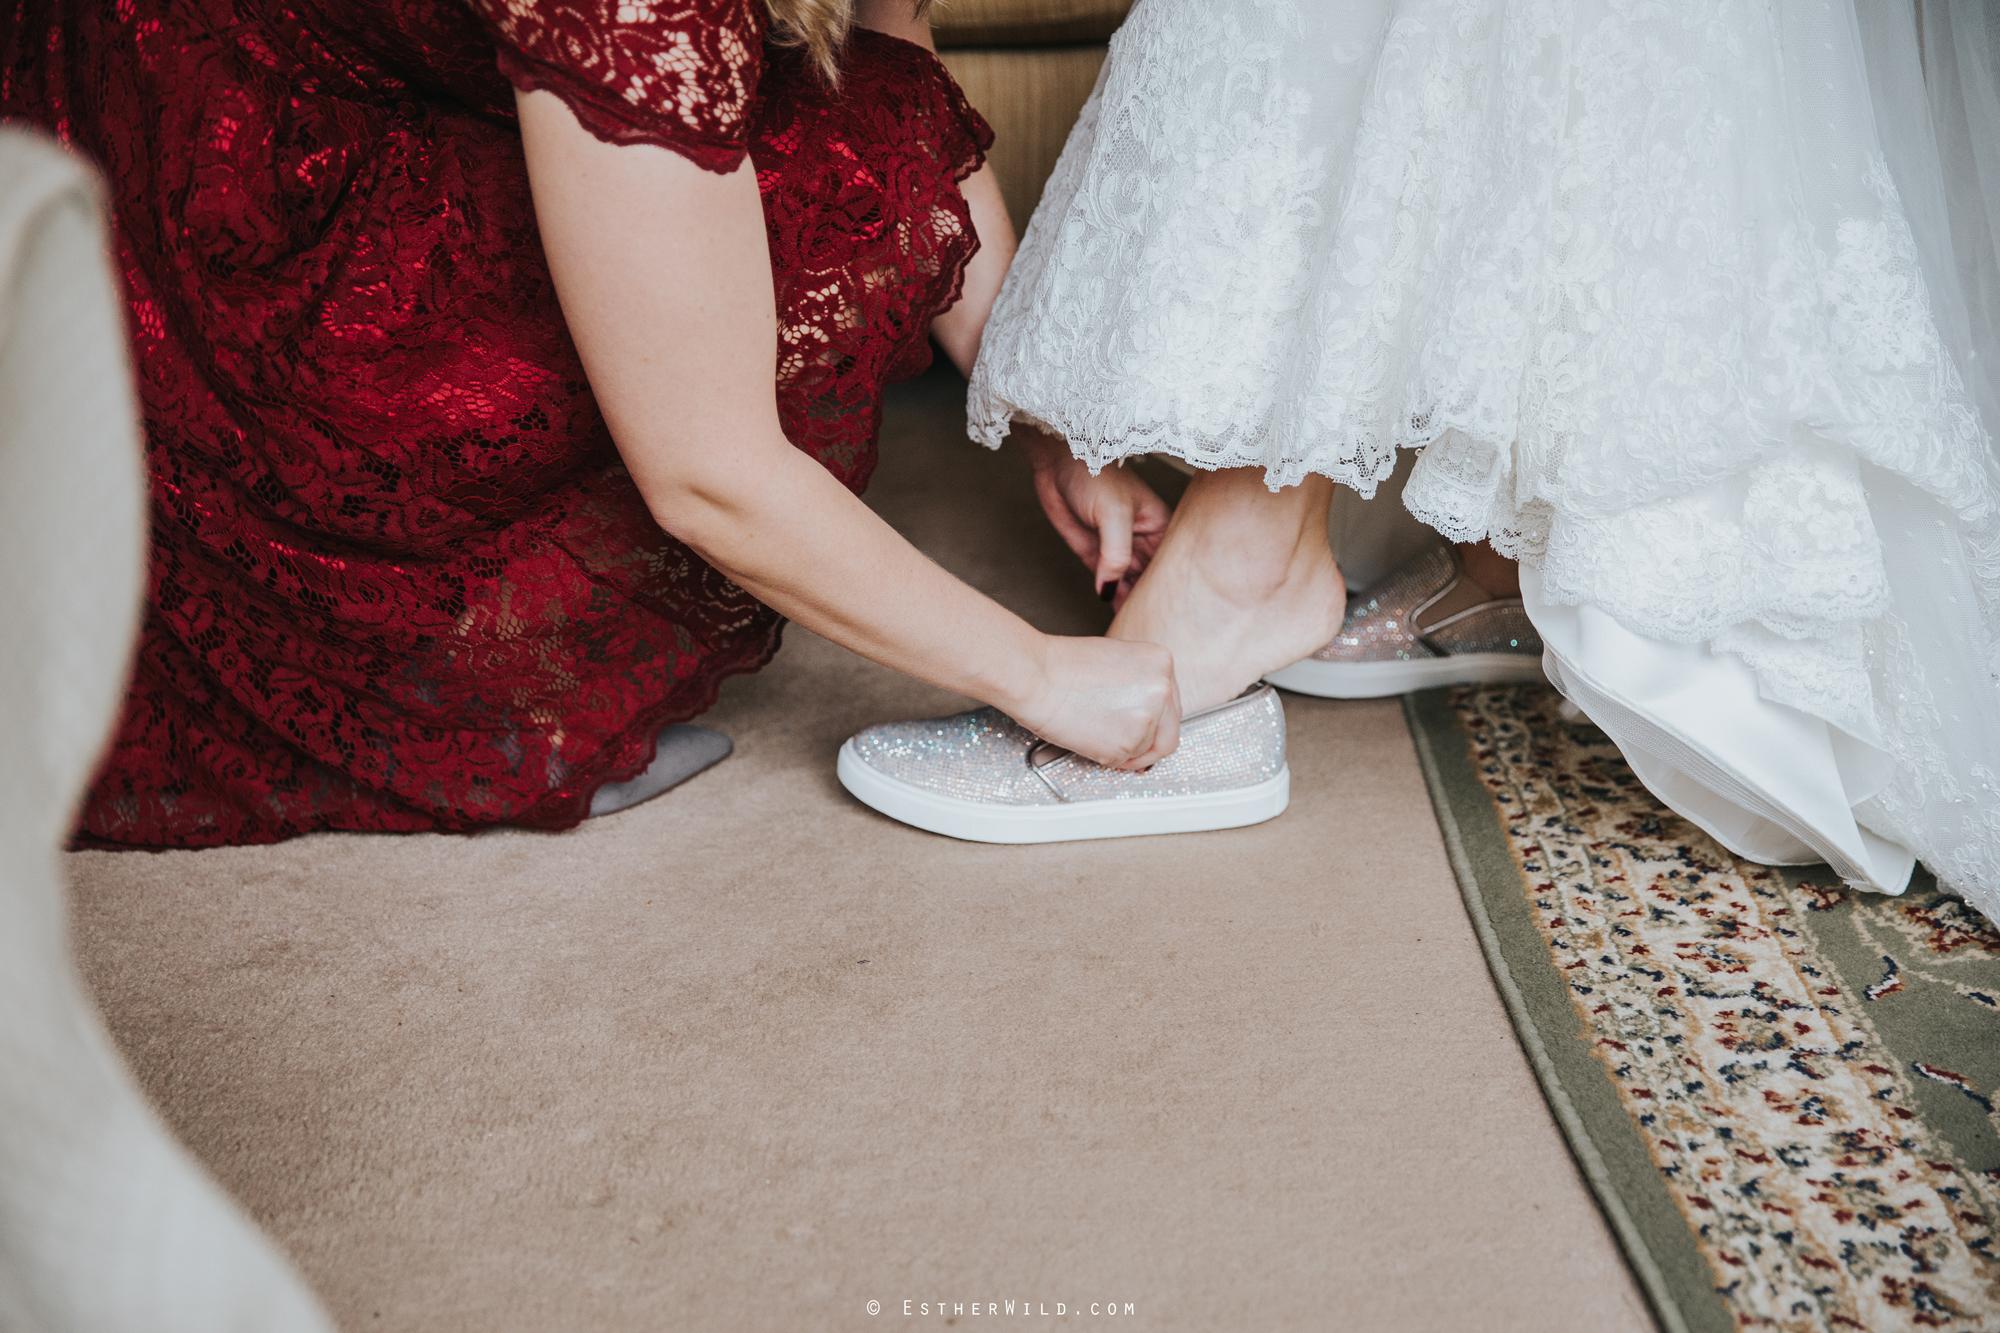 Reading_Room_Weddings_Alby_Norwich_Photographer_Esther_Wild_IMG_0575.jpg